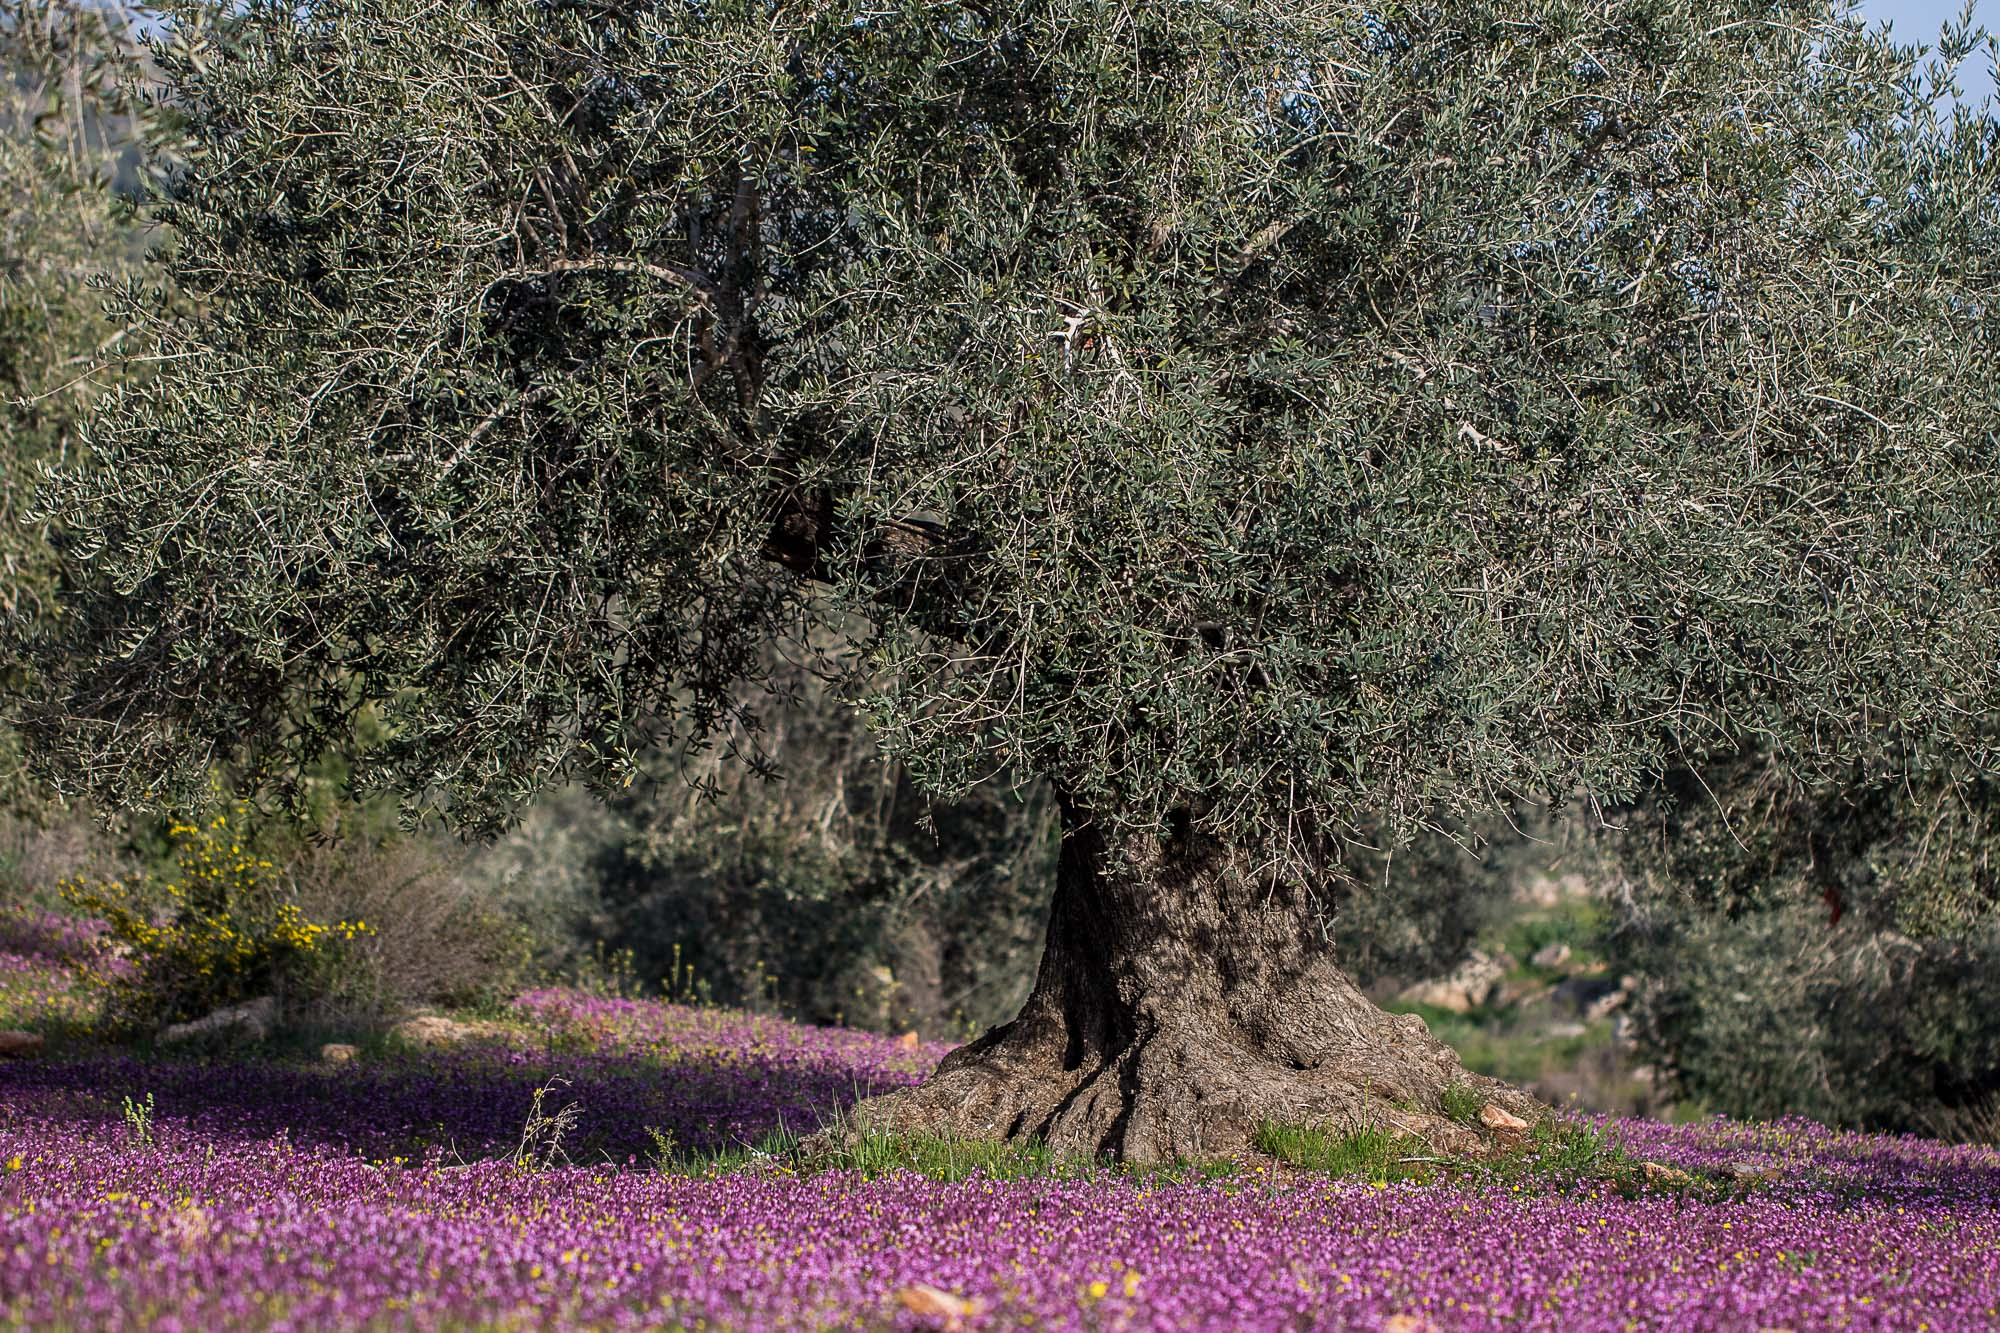 Ancient Olive Orchards in Palestine - © Ahmad Al Omari